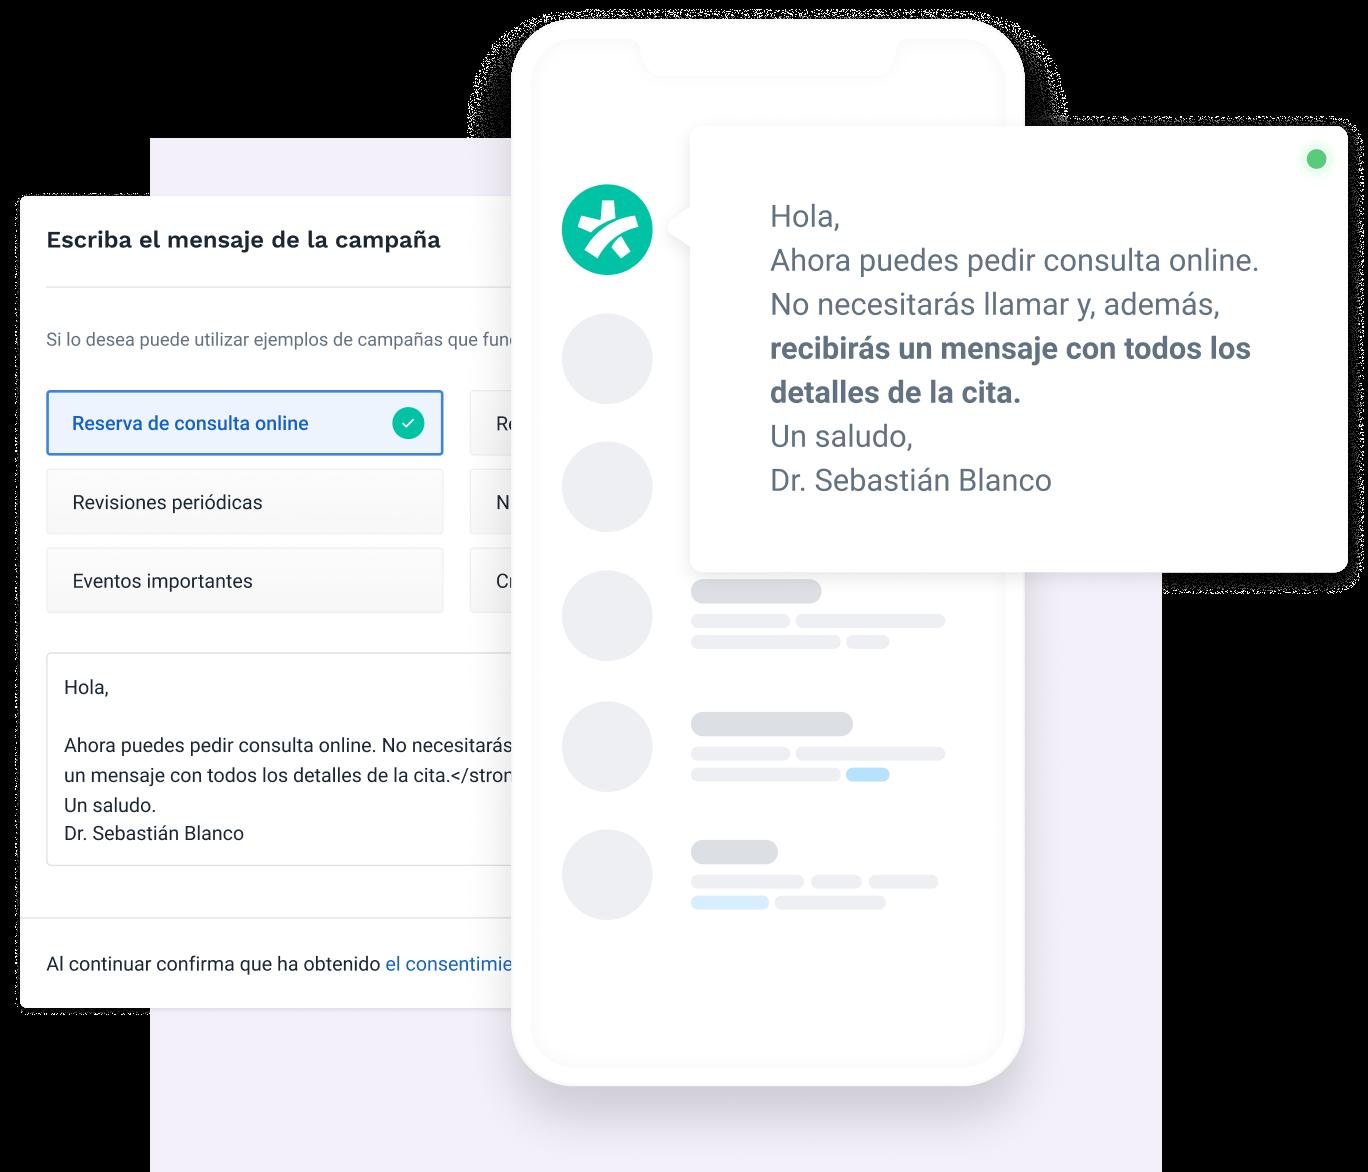 es-online-consultation-lp-solution-4@2x